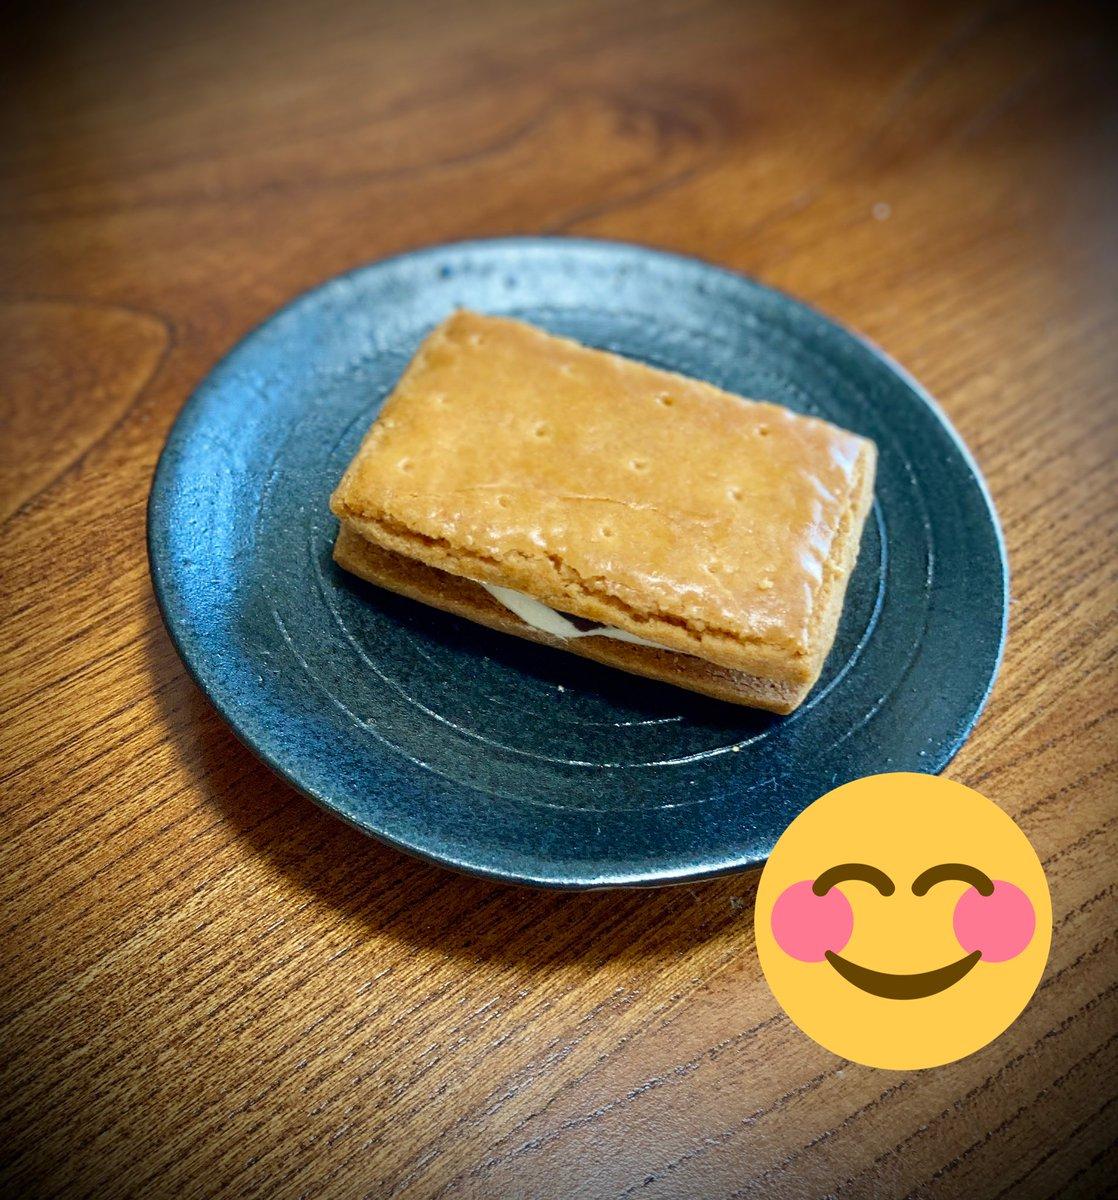 test ツイッターメディア - 神奈川県民の私は【レーズンウィッチ】=鎌倉小川軒の銘菓だと思ってきたが、代官山小川軒の菓子が先祖だったとつい最近知る。見た目こそ似るが味は別物でそこにも驚く。代官山も鎌倉どちらも美味しいけどね! https://t.co/1OA7xwjXEy